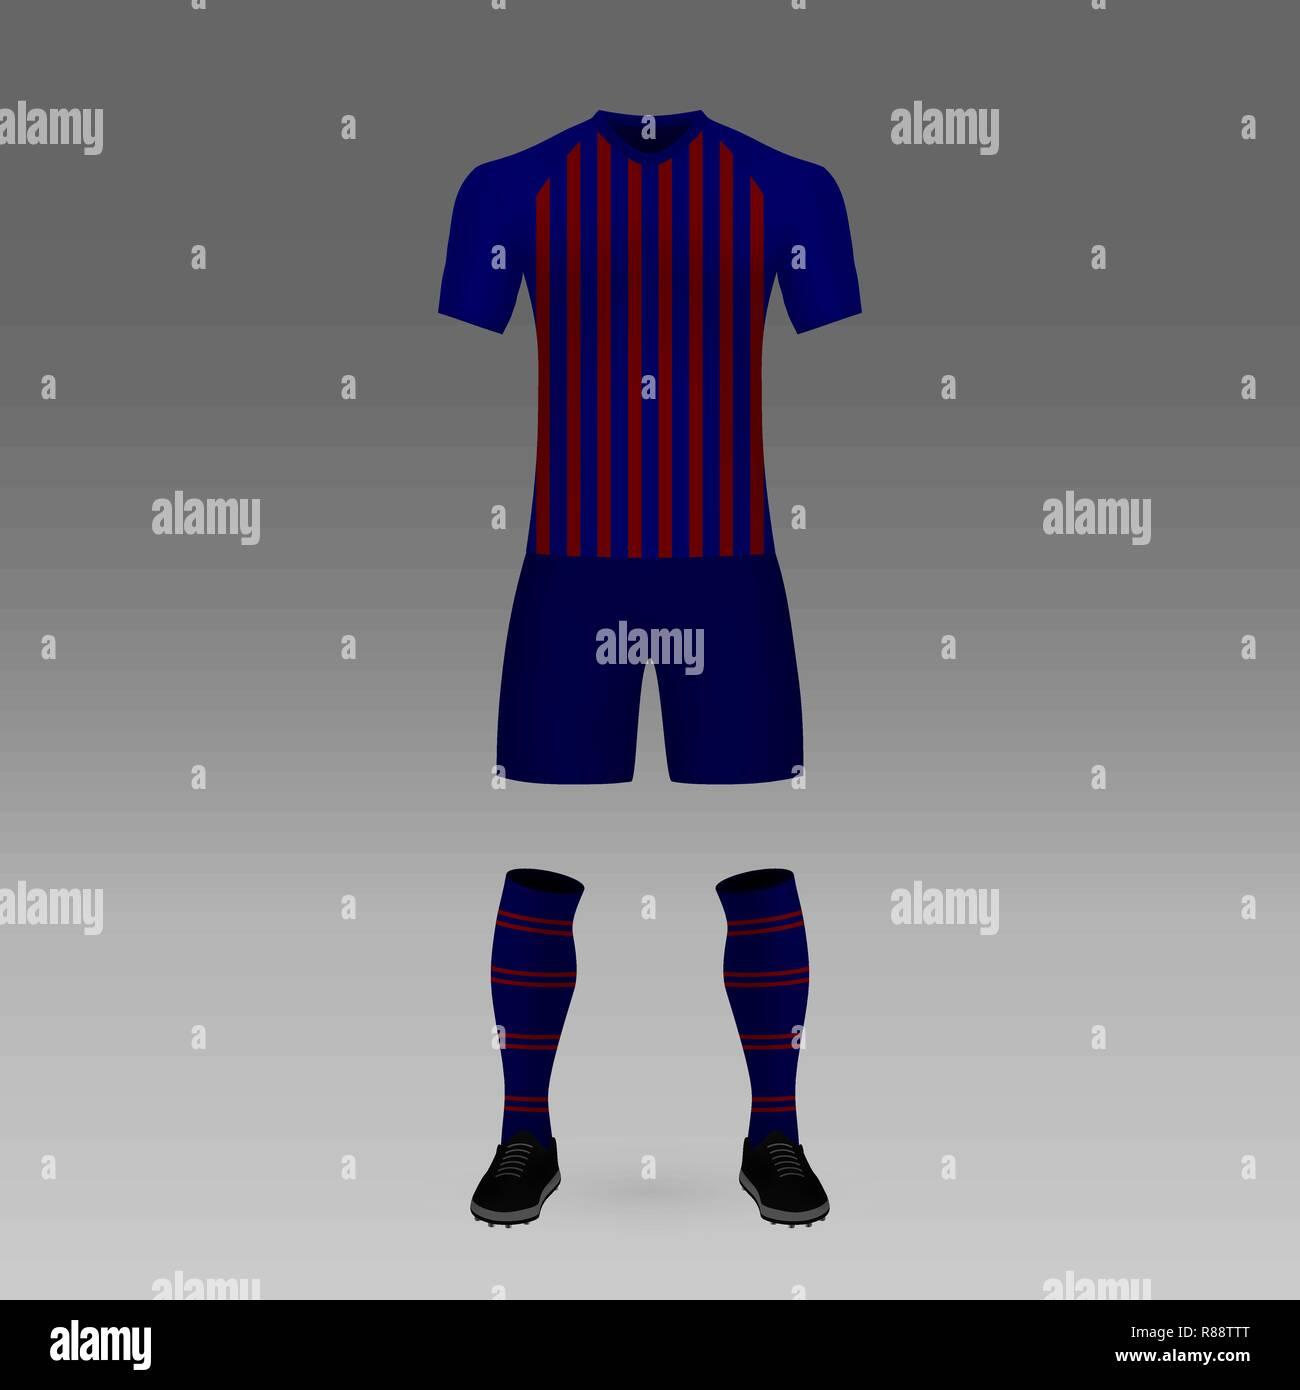 football kit Barcelona, shirt template for soccer jersey. Vector illustration - Stock Image